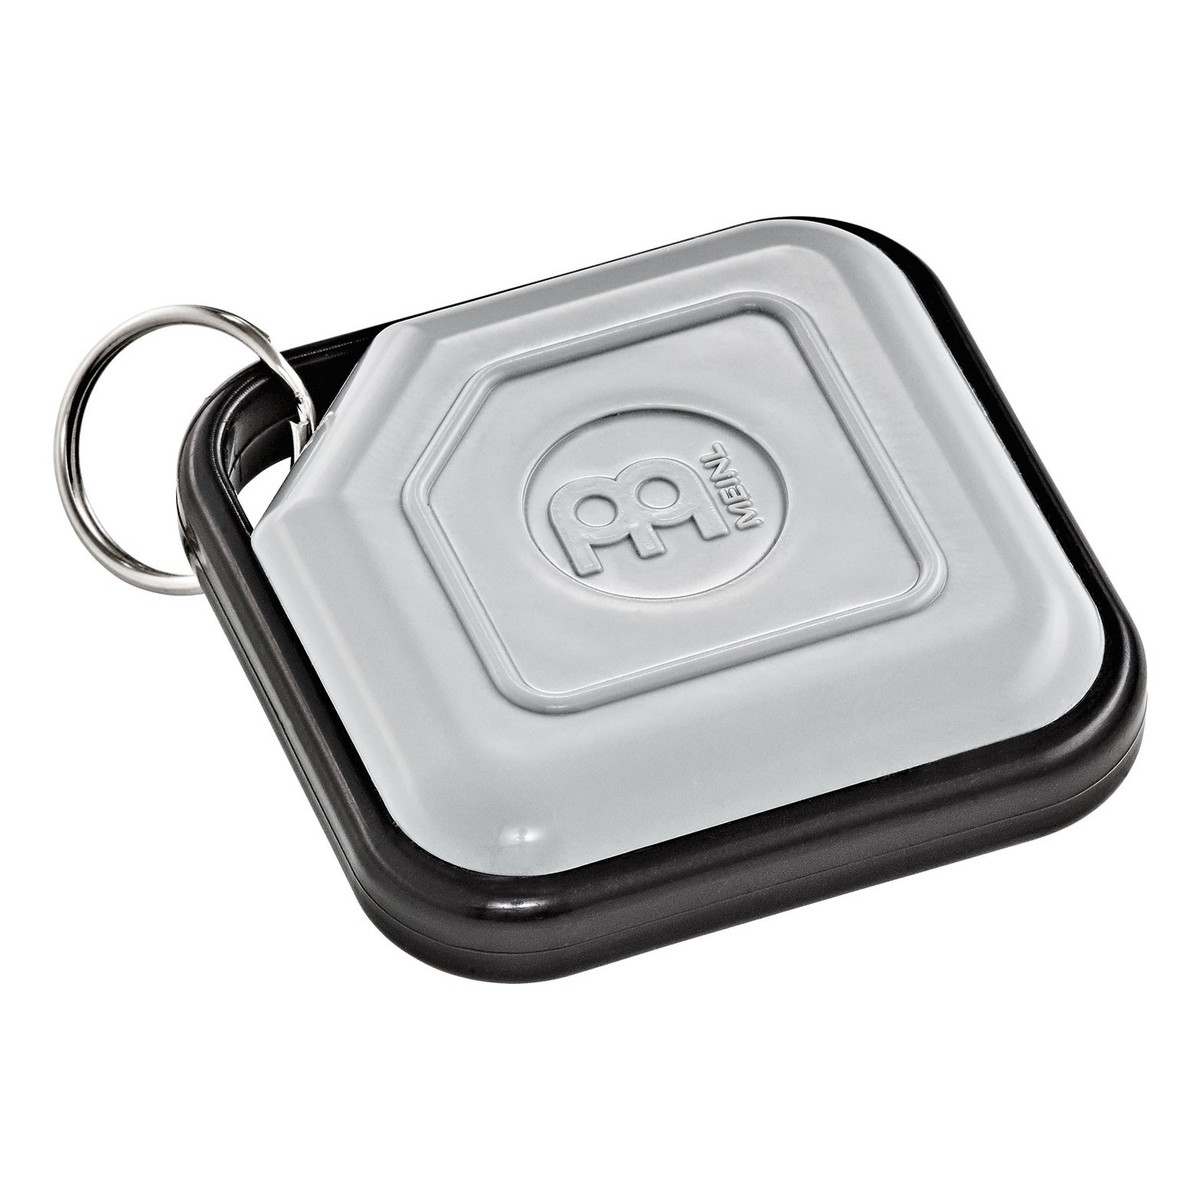 Meinl Percussion Key Ring Shaker, Grey